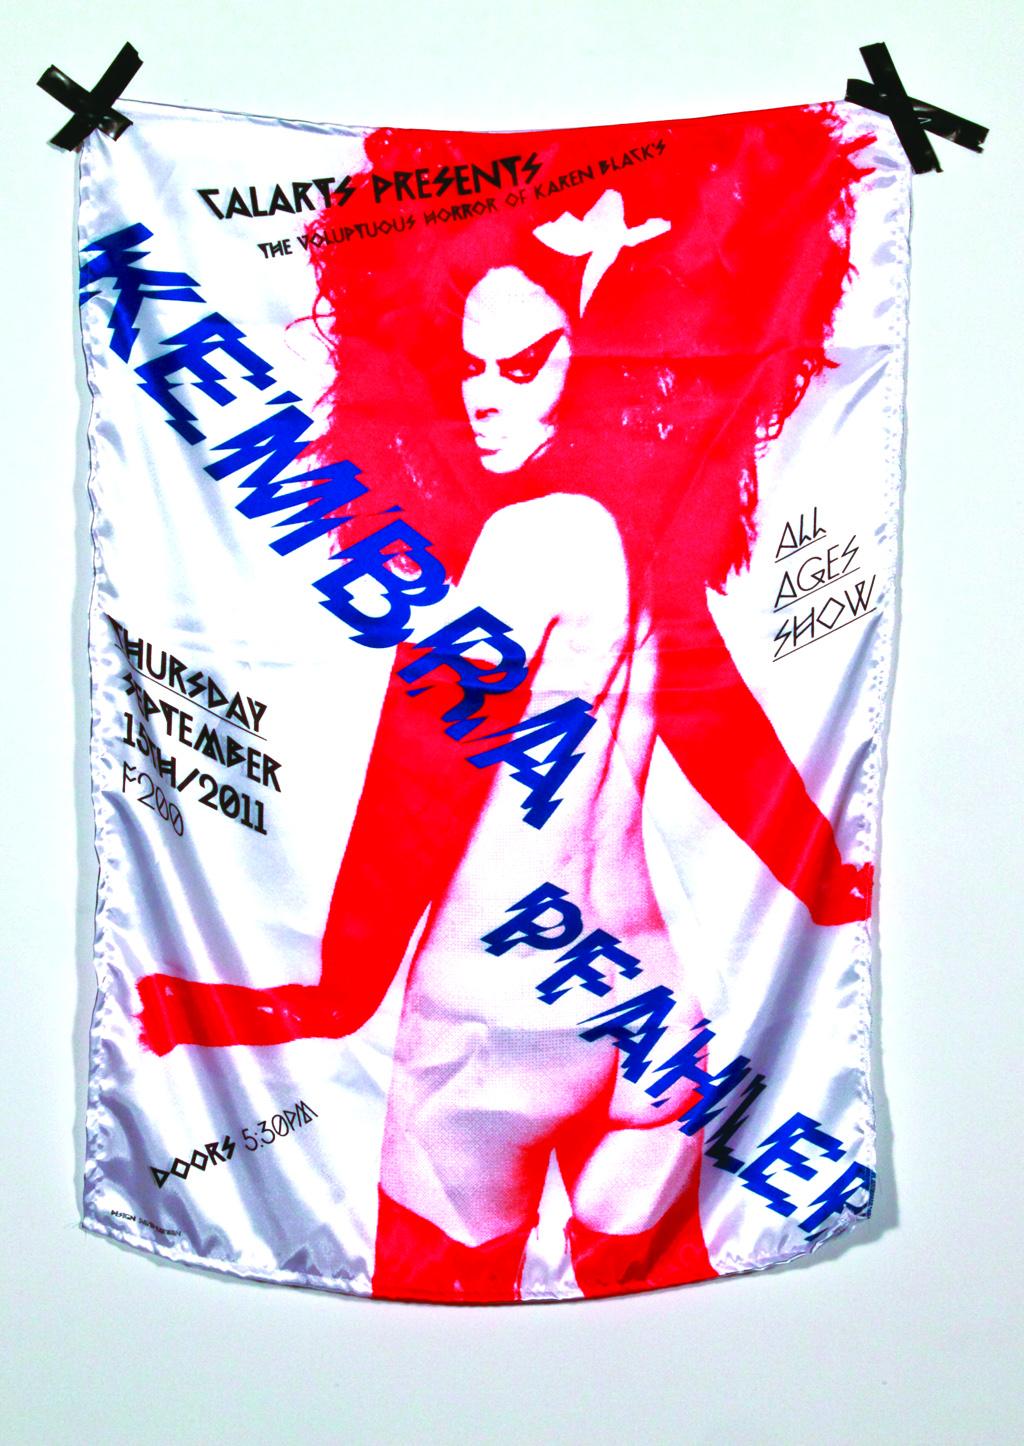 Visiting artist announcement for Kembra Phaler, CalArts, 2011